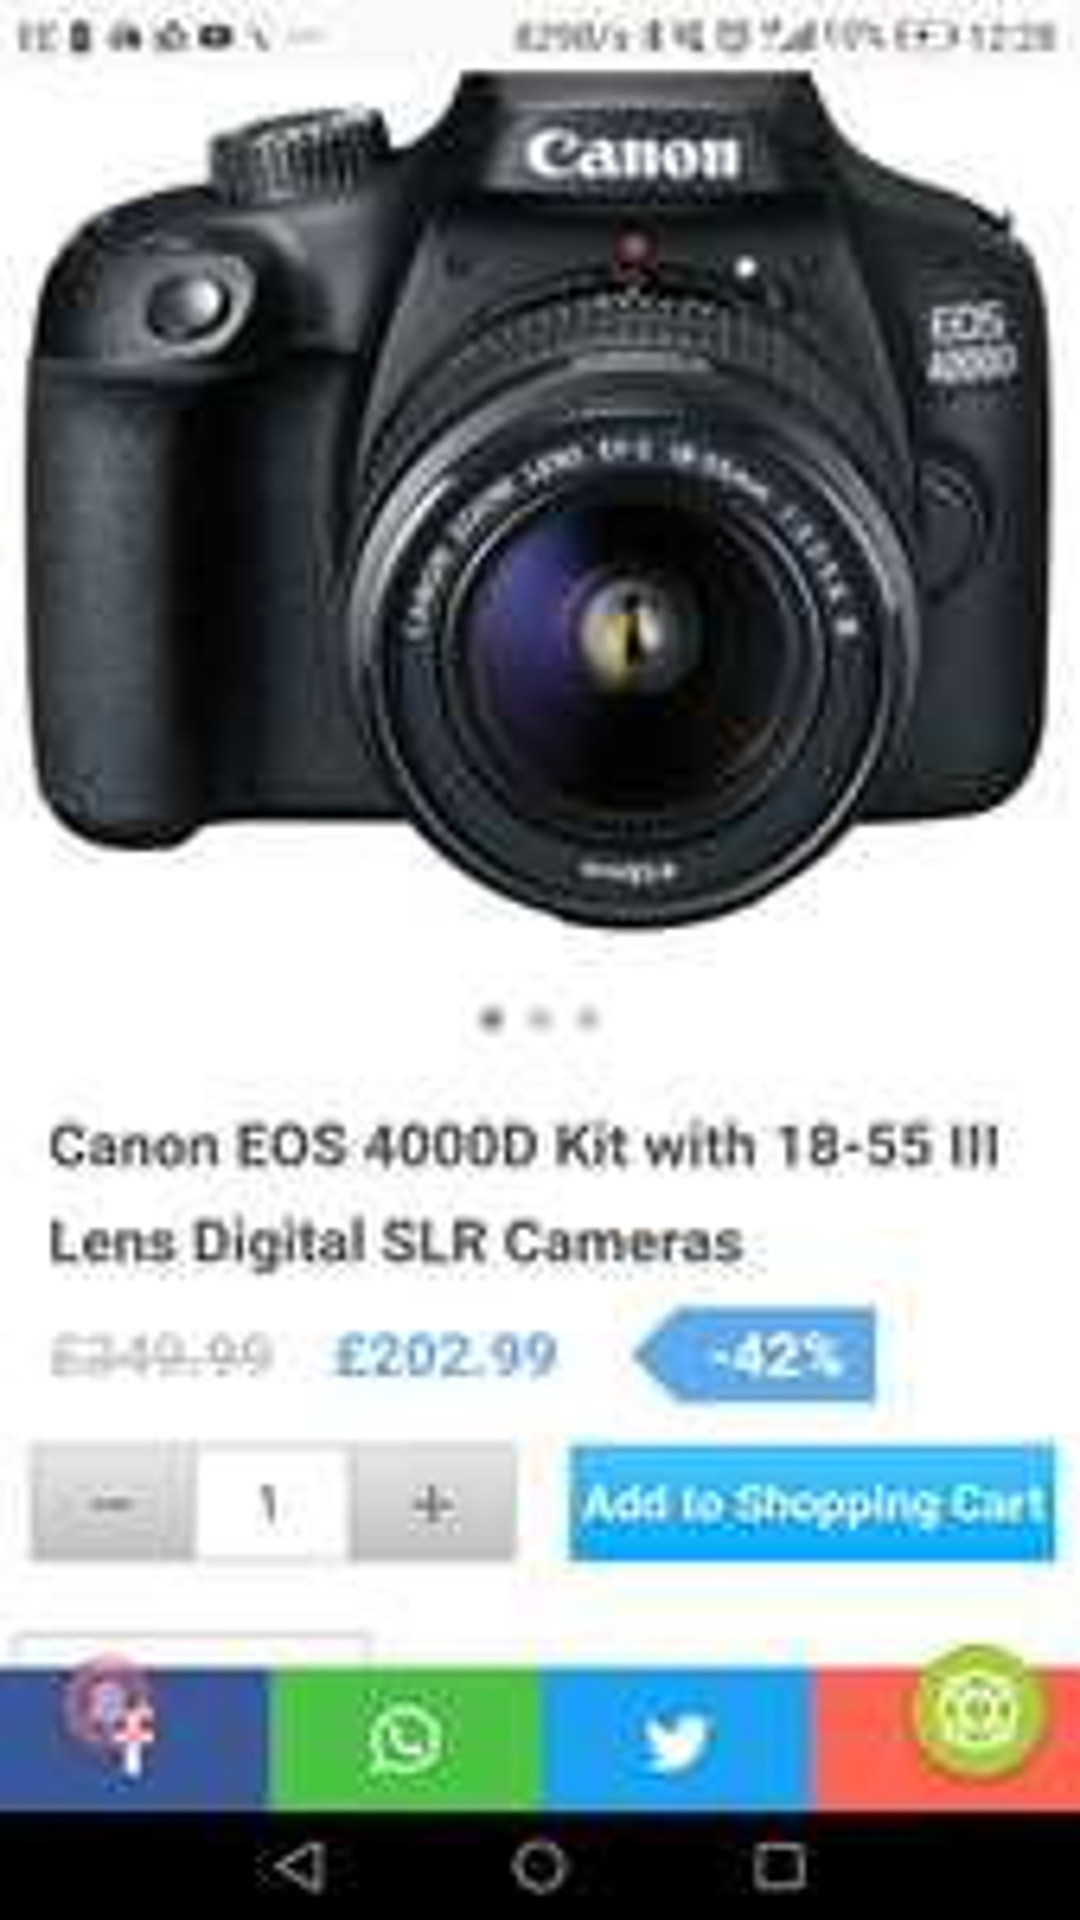 Canon Eos 4000dD kit with 18-50 lens digital SLR camera £197.99 @ eGlobal central